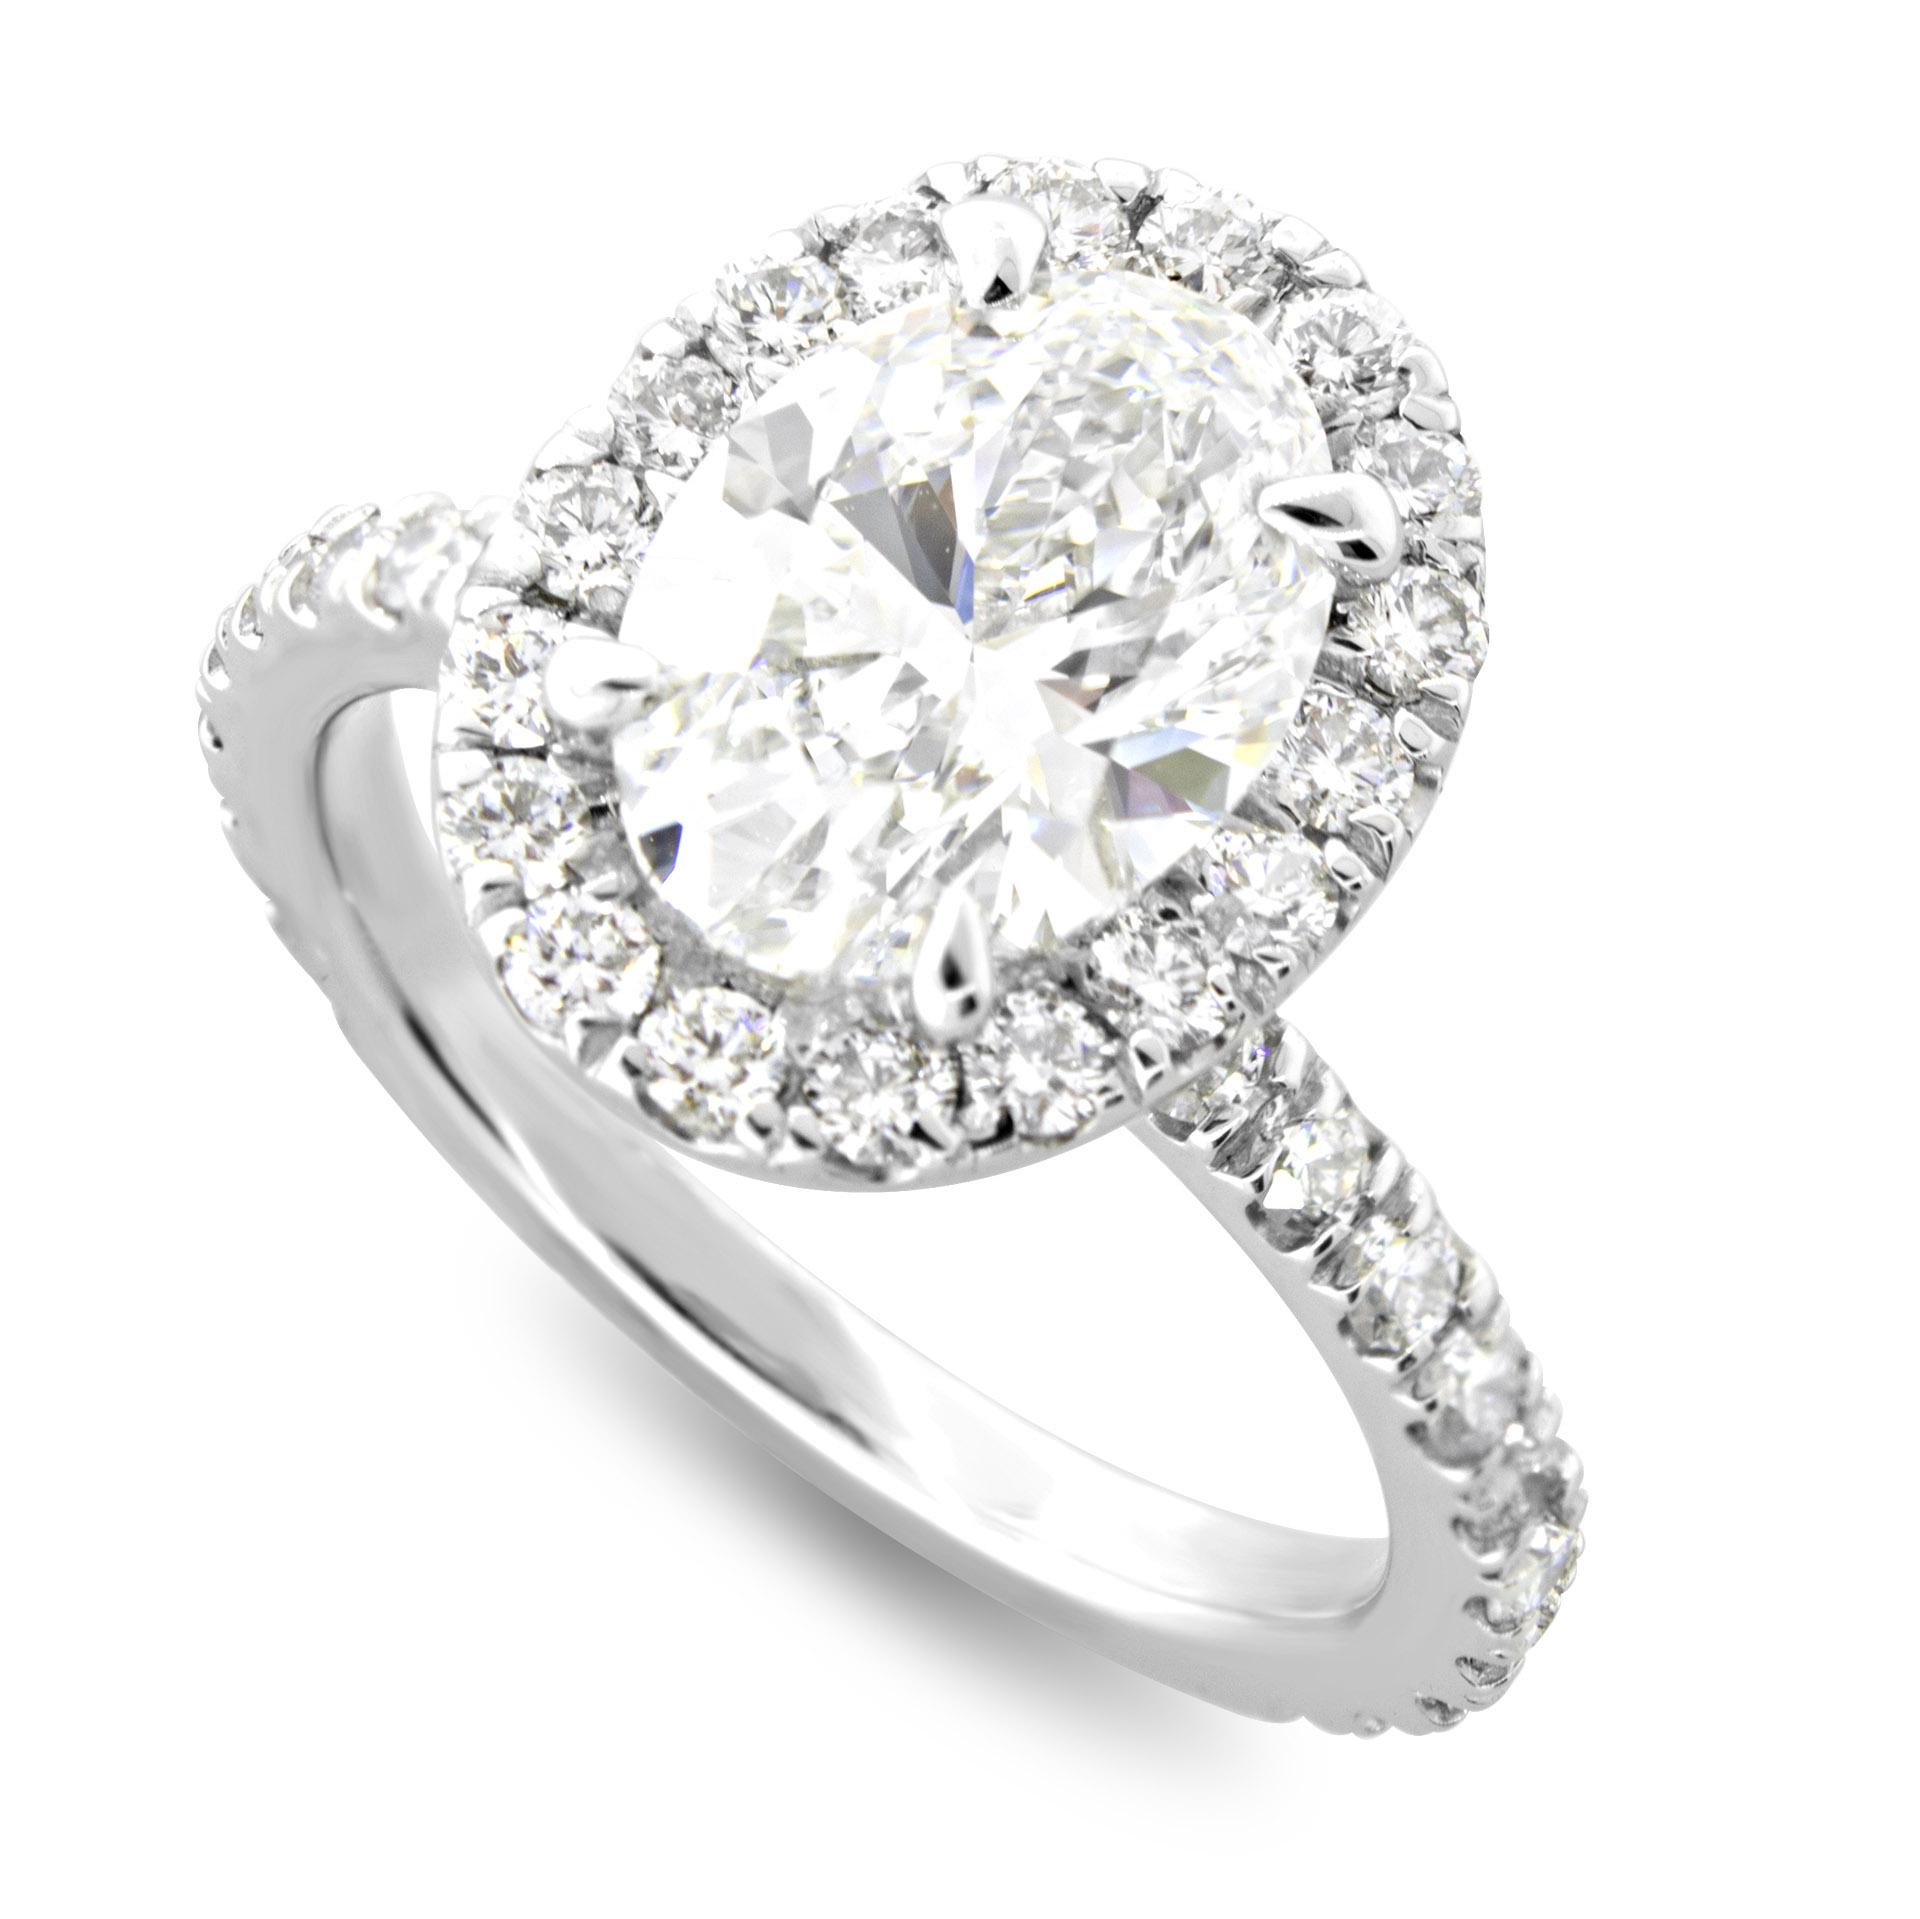 Oval Halo Diamond Engagement Ring Gold Or Platinum Sarkisians Jewelry